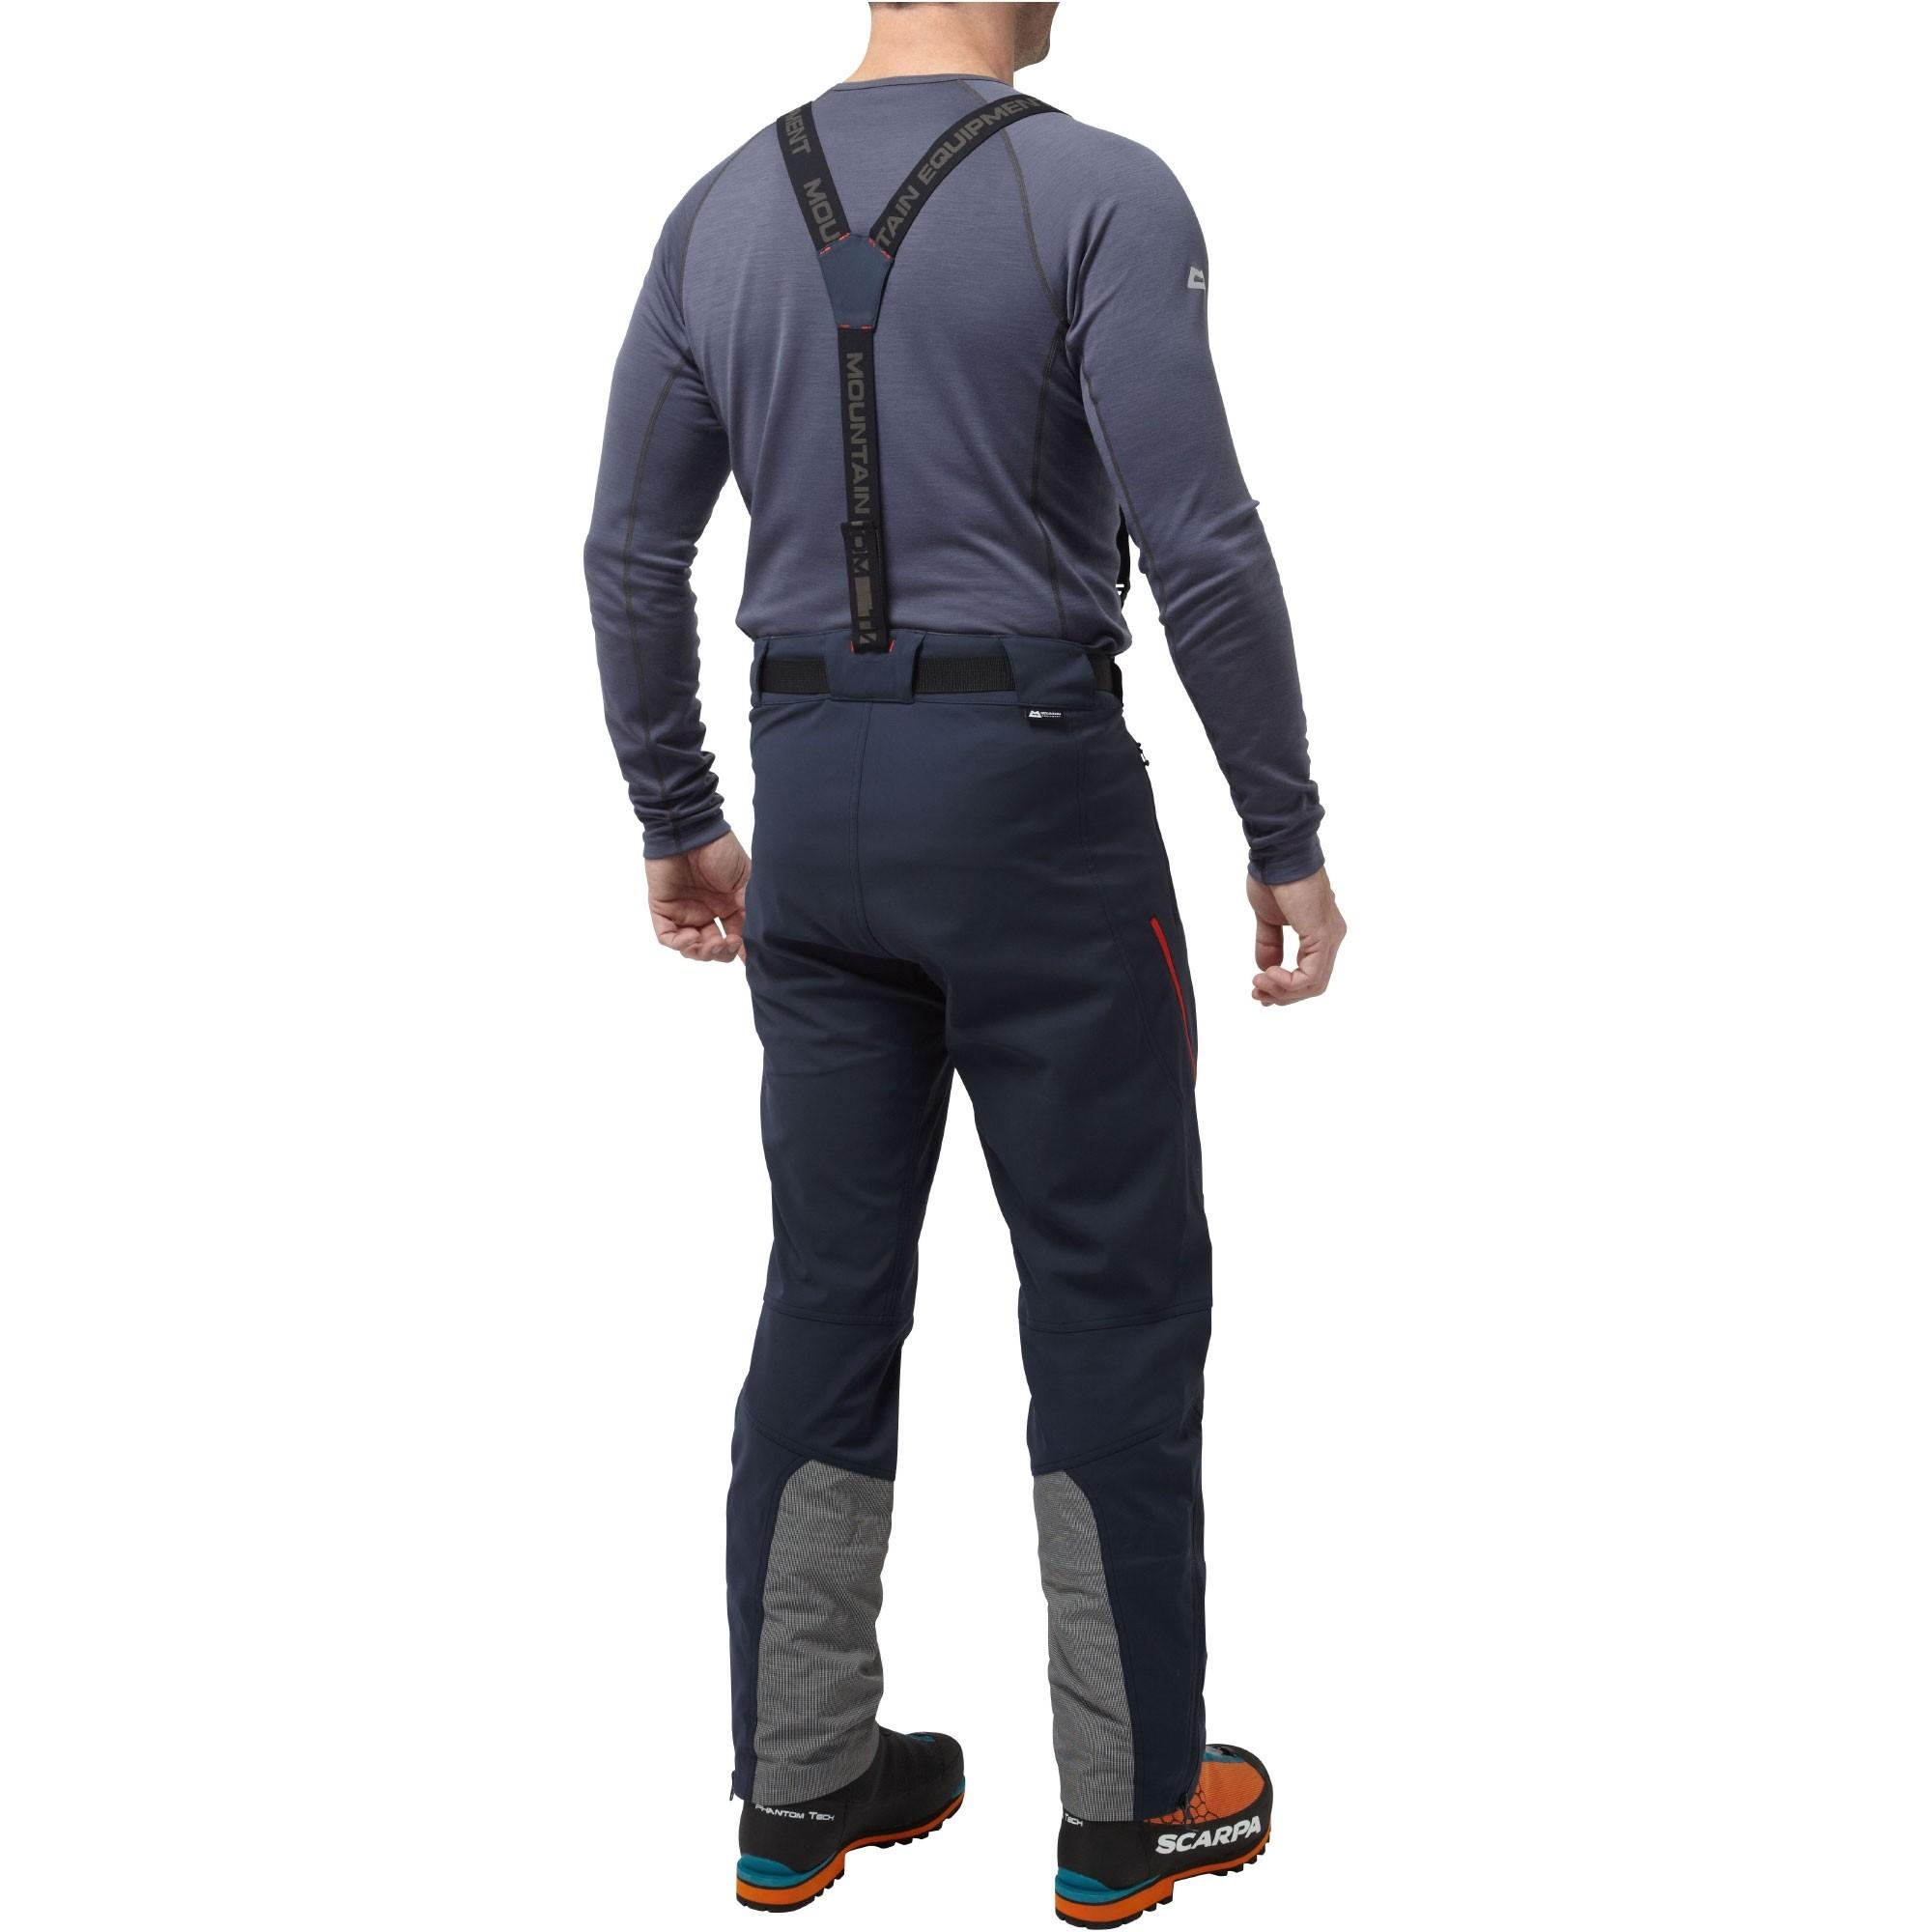 Mountain Equipment G2 Men's Mountain Pant - Cosmos - back